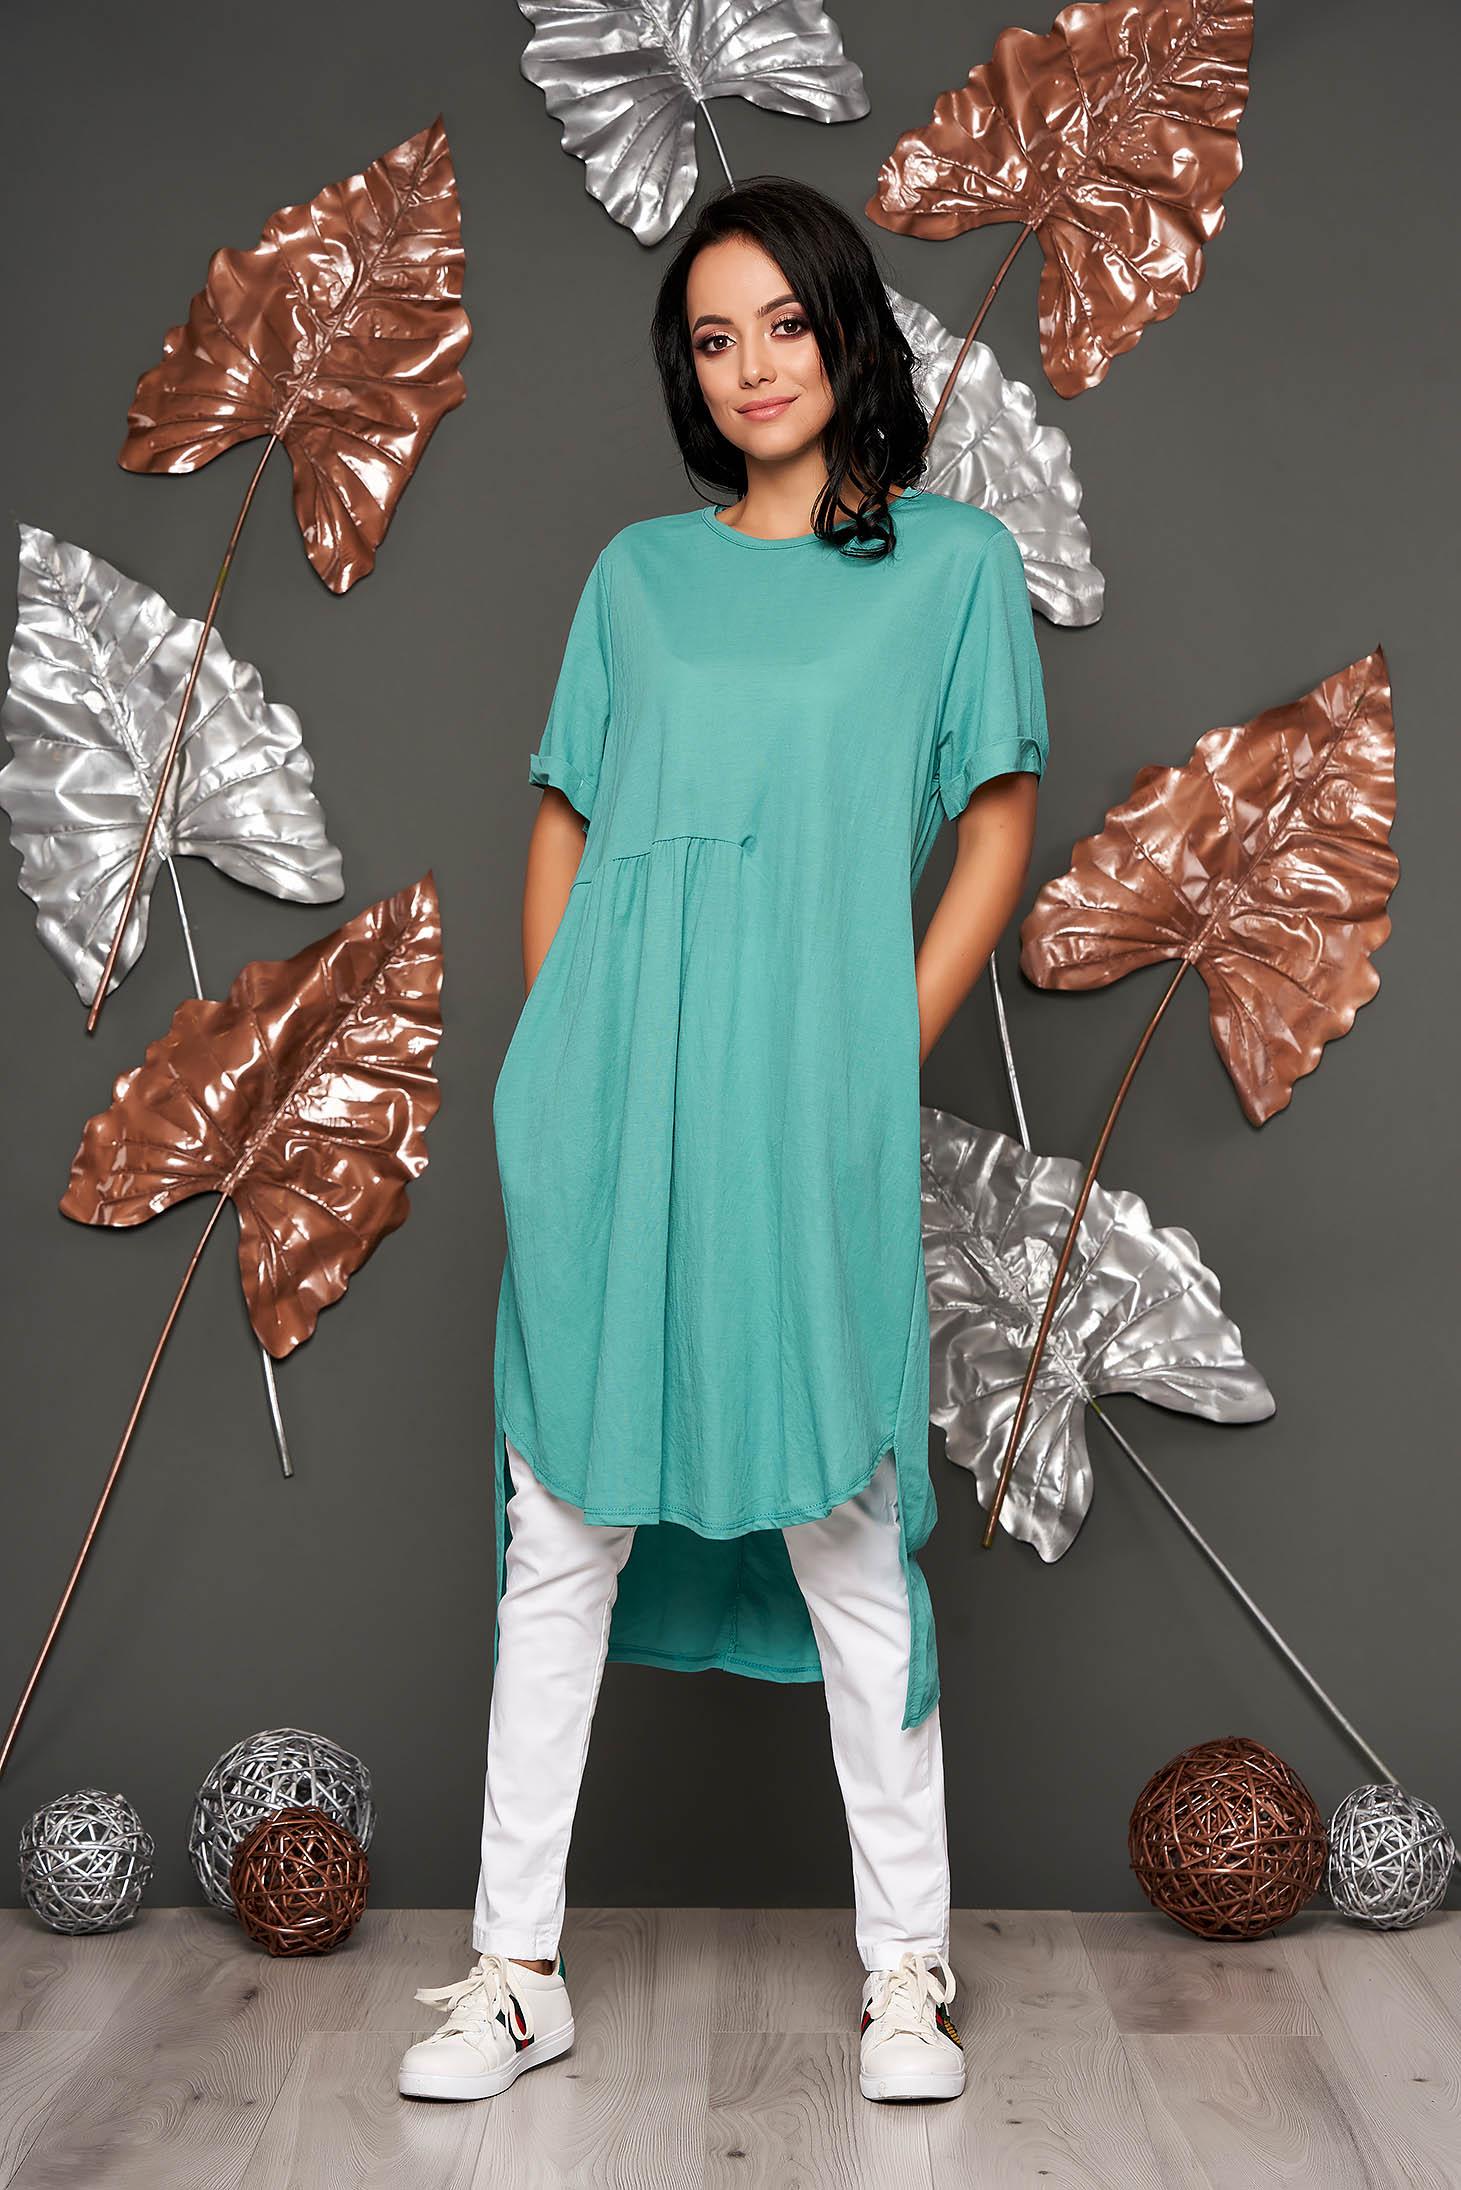 Türkizzöld casual bő szabású rövid ujjú ruha